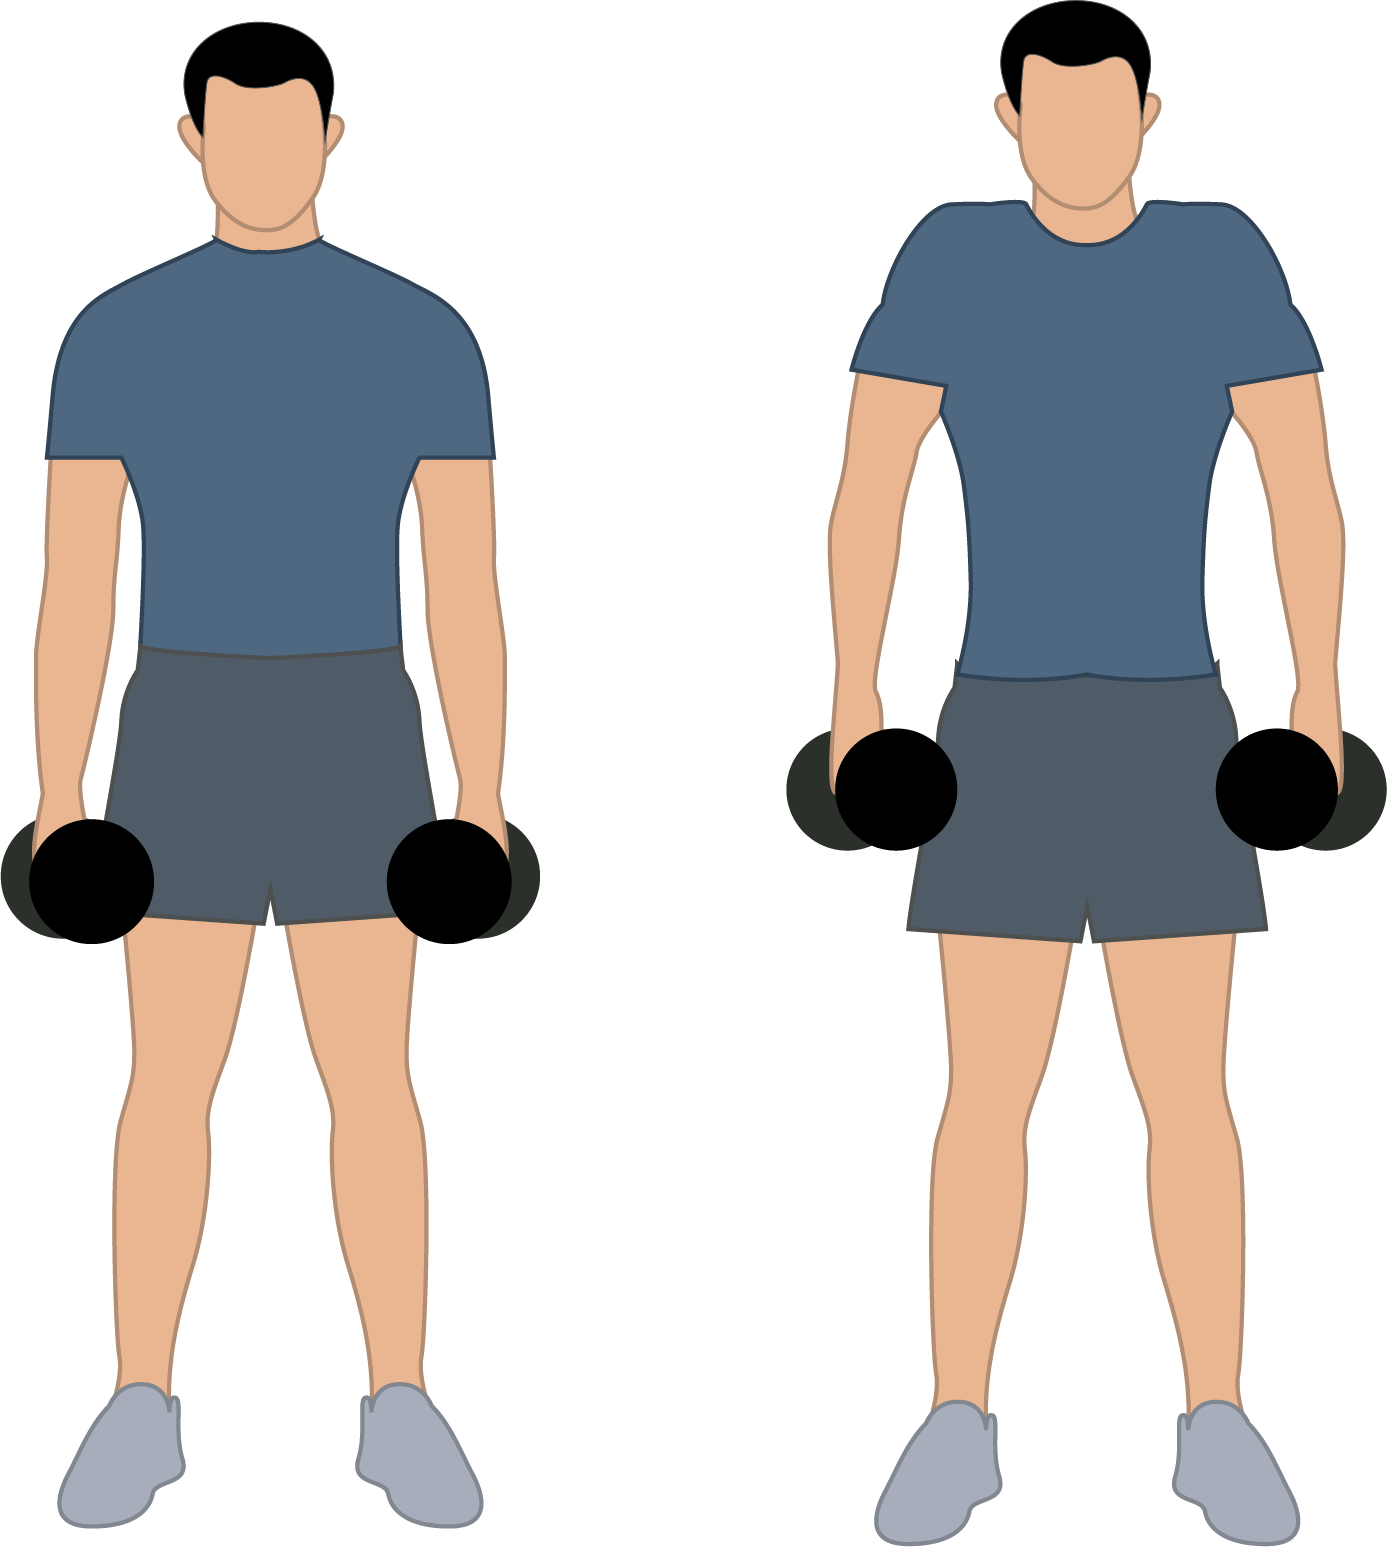 L'exercice des shurgs